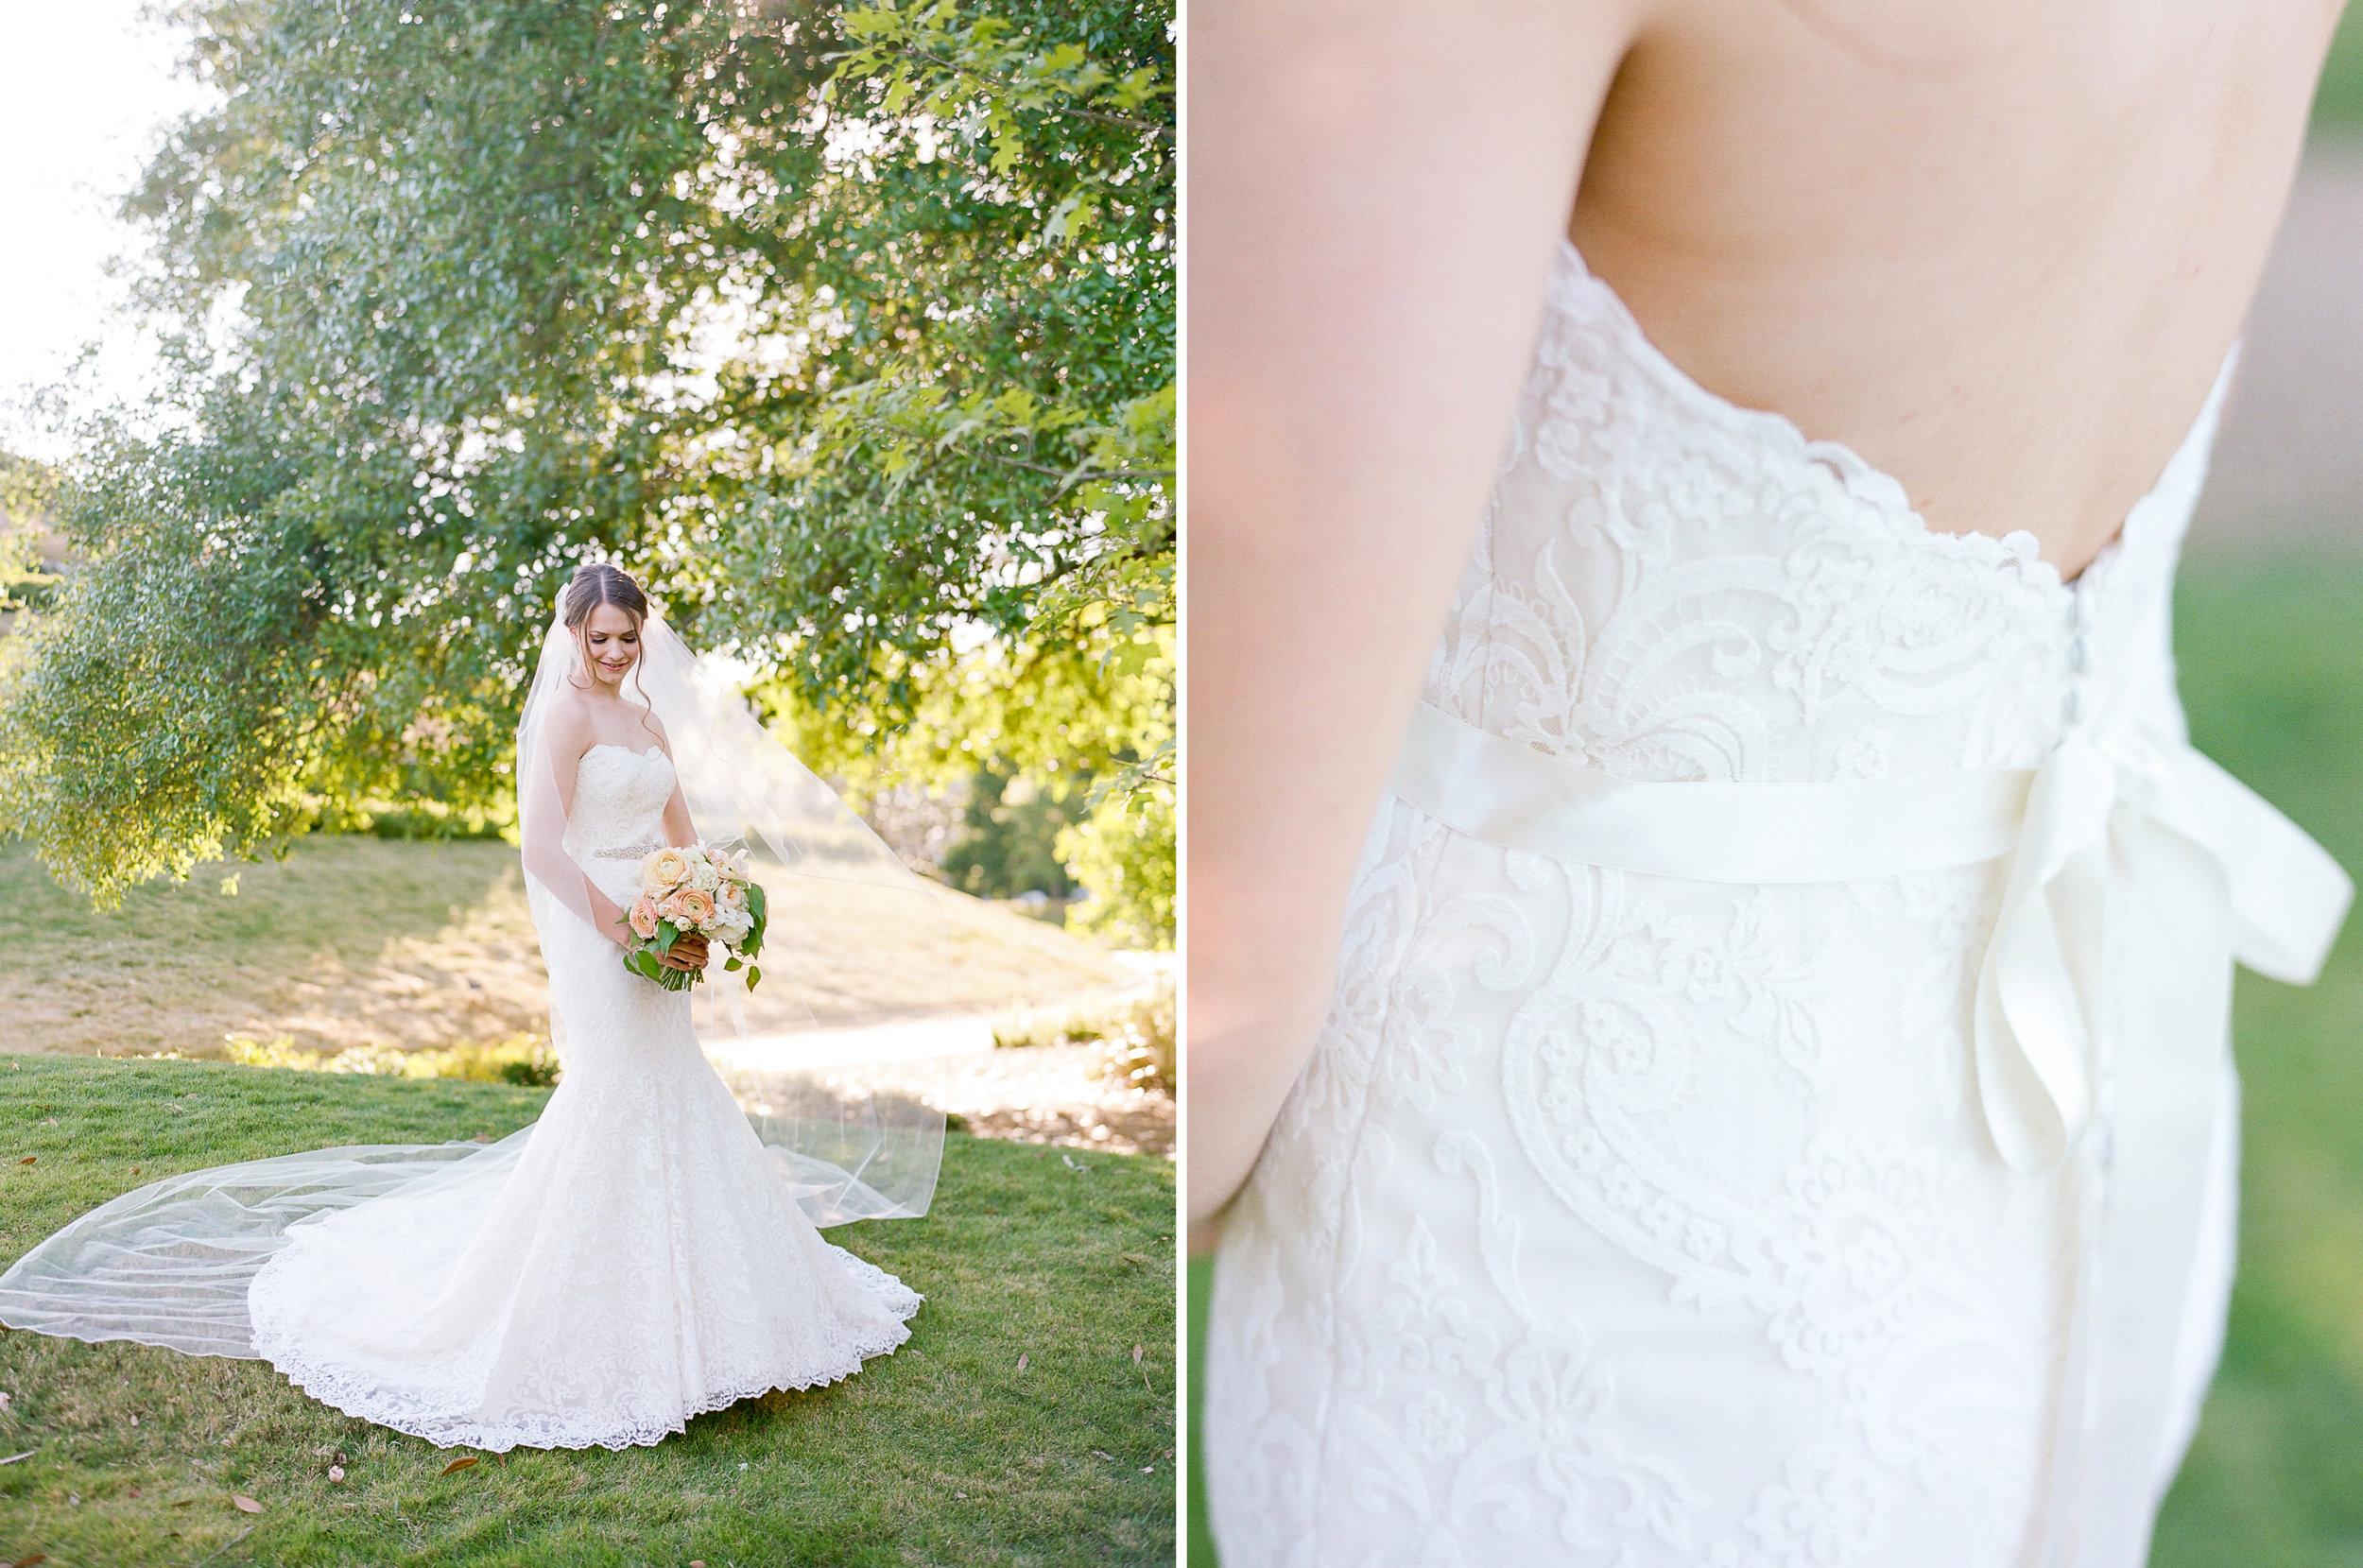 Houston-Wedding-Photographer-Film-Fine-Art-Bridals-Dana Fernandez-Photography-101.jpg